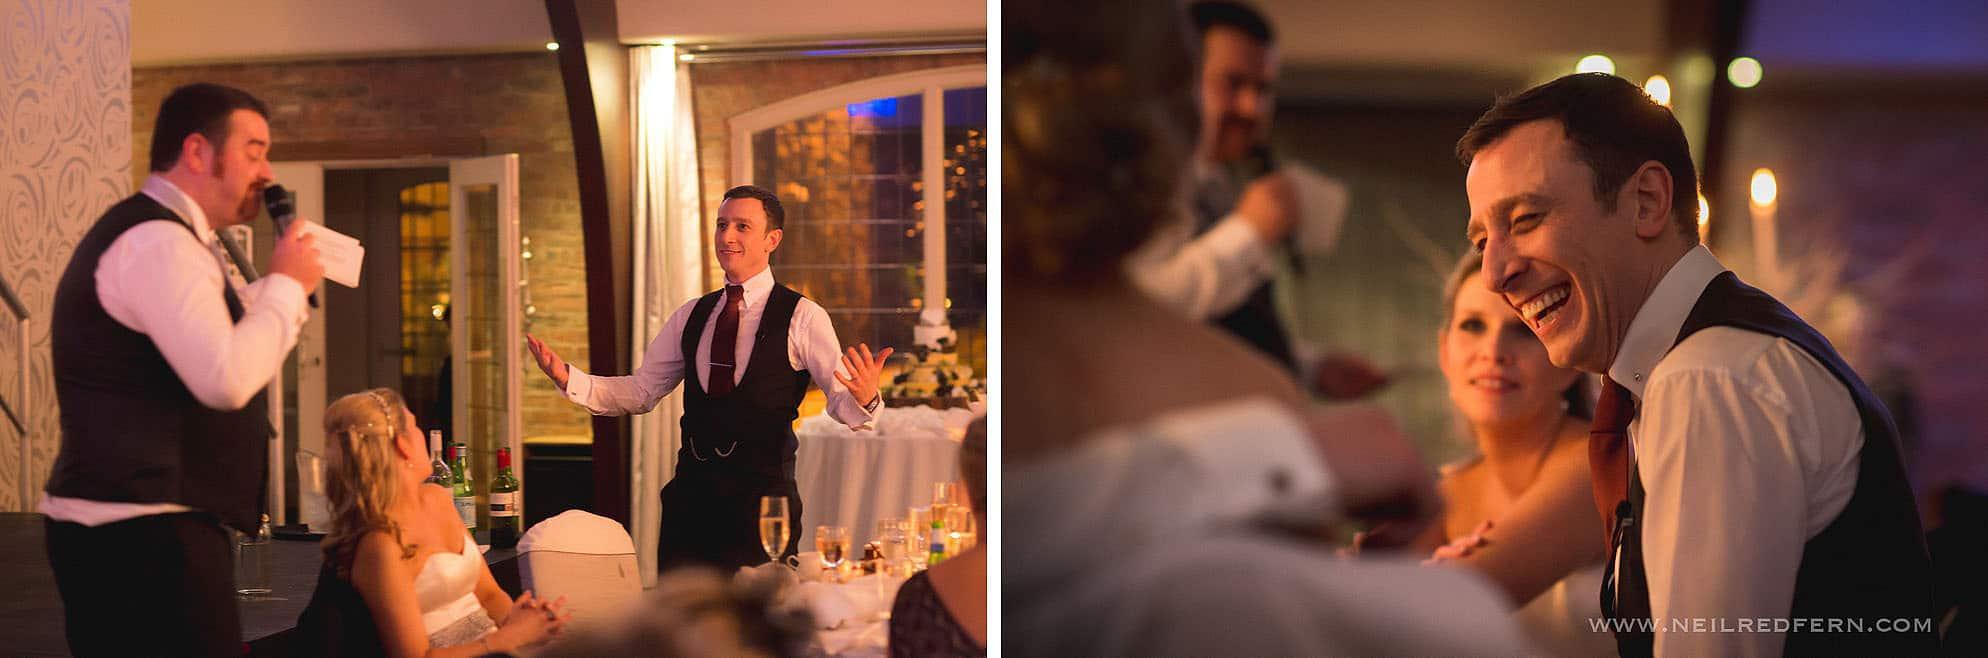 Colshaw Hall wedding photography 11